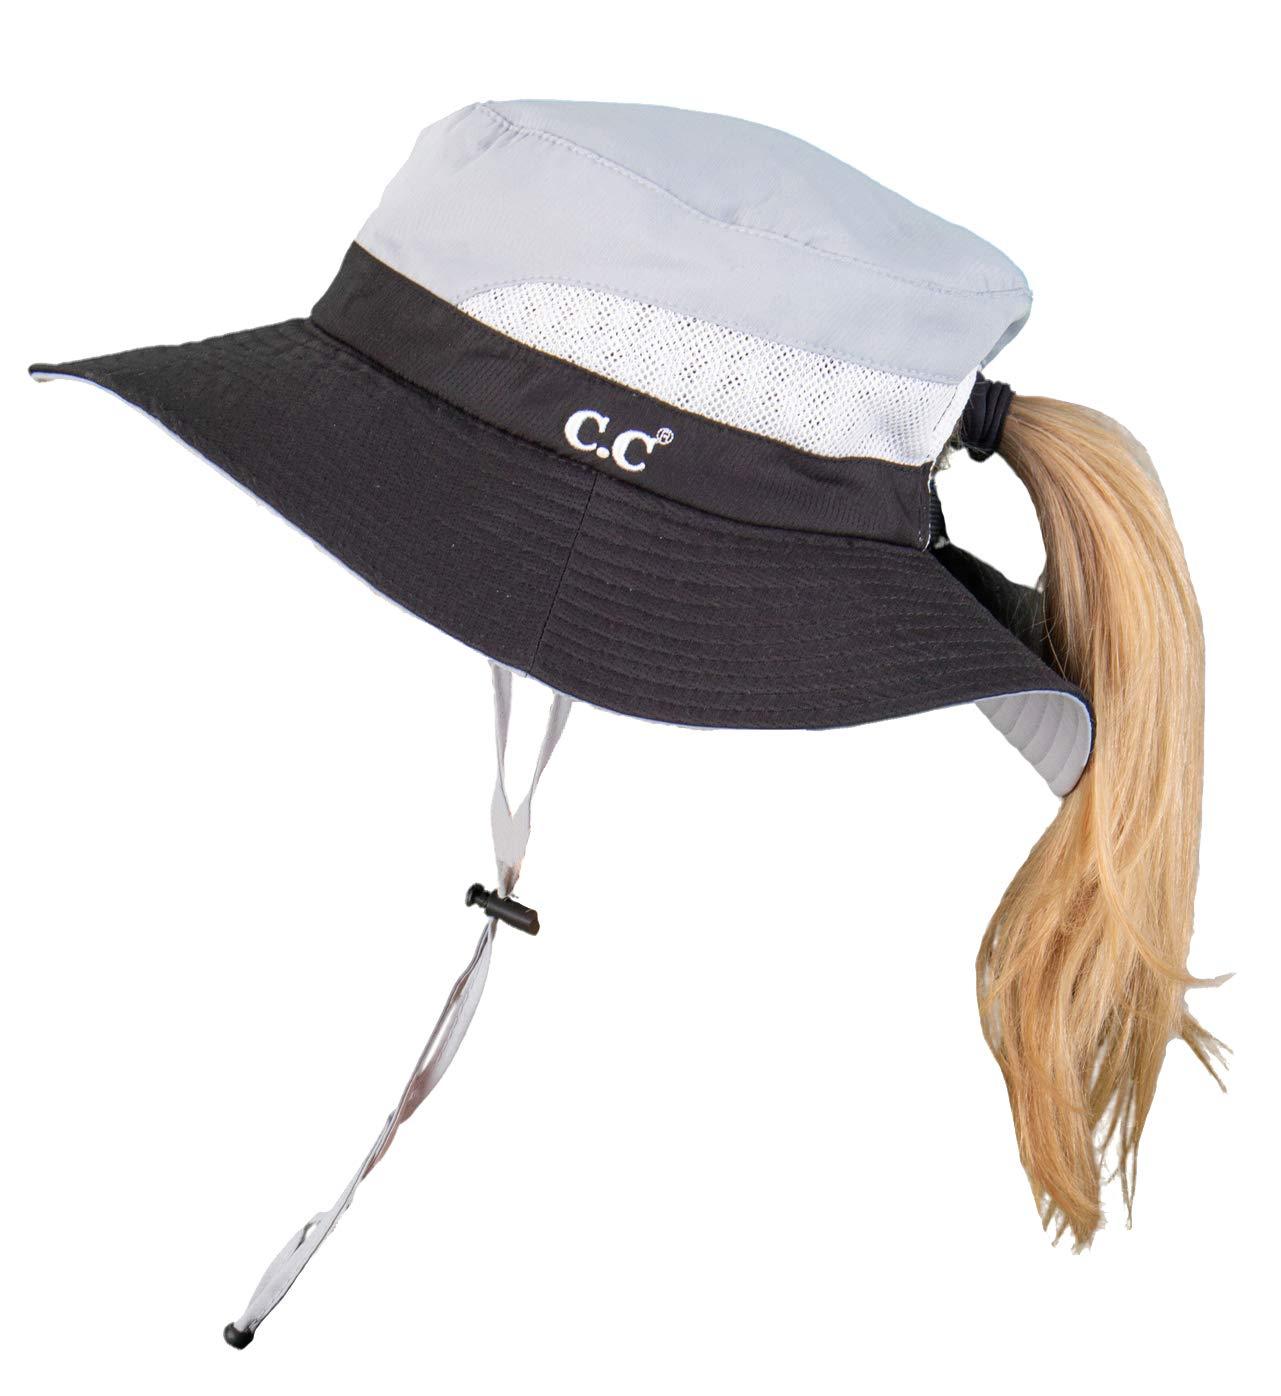 SH-2177-0621 Ponytail Sun Hat Foldable Mesh Outdoor Beach Bucket Hat, Black/Grey